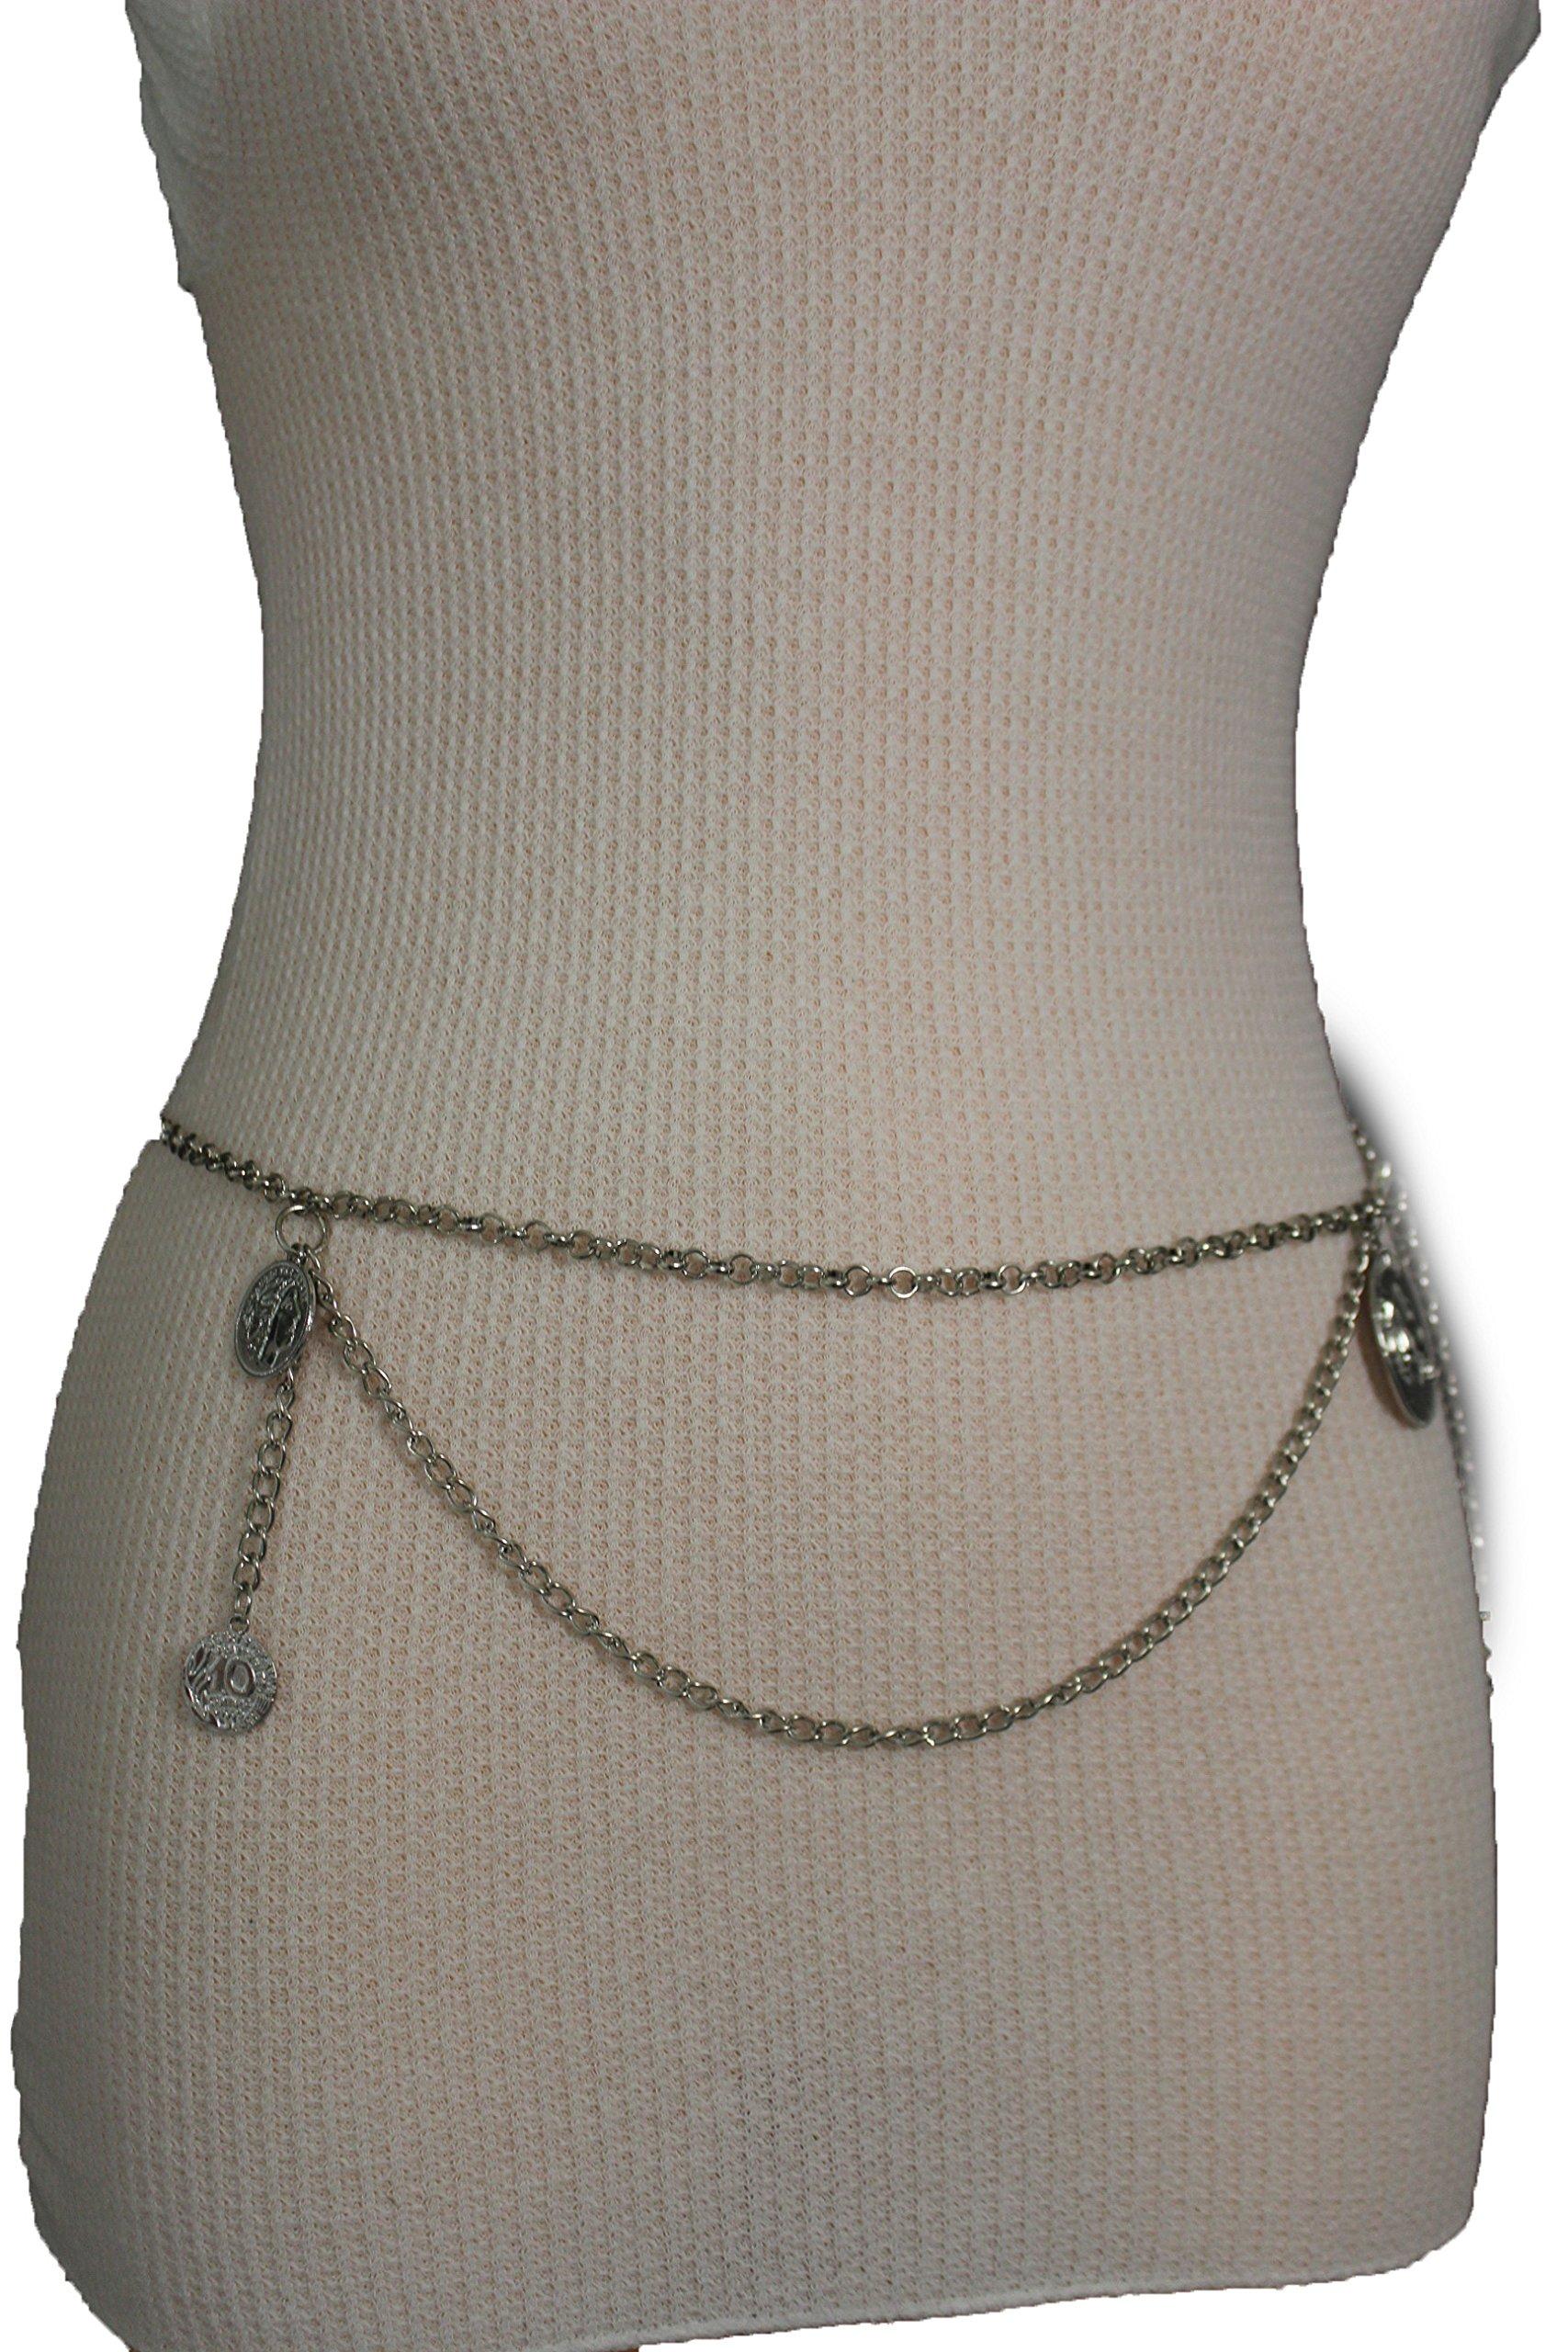 TFJ Women Fashion Metal Chain Belt Hip Waist Links Coin Charm M L XL Silver